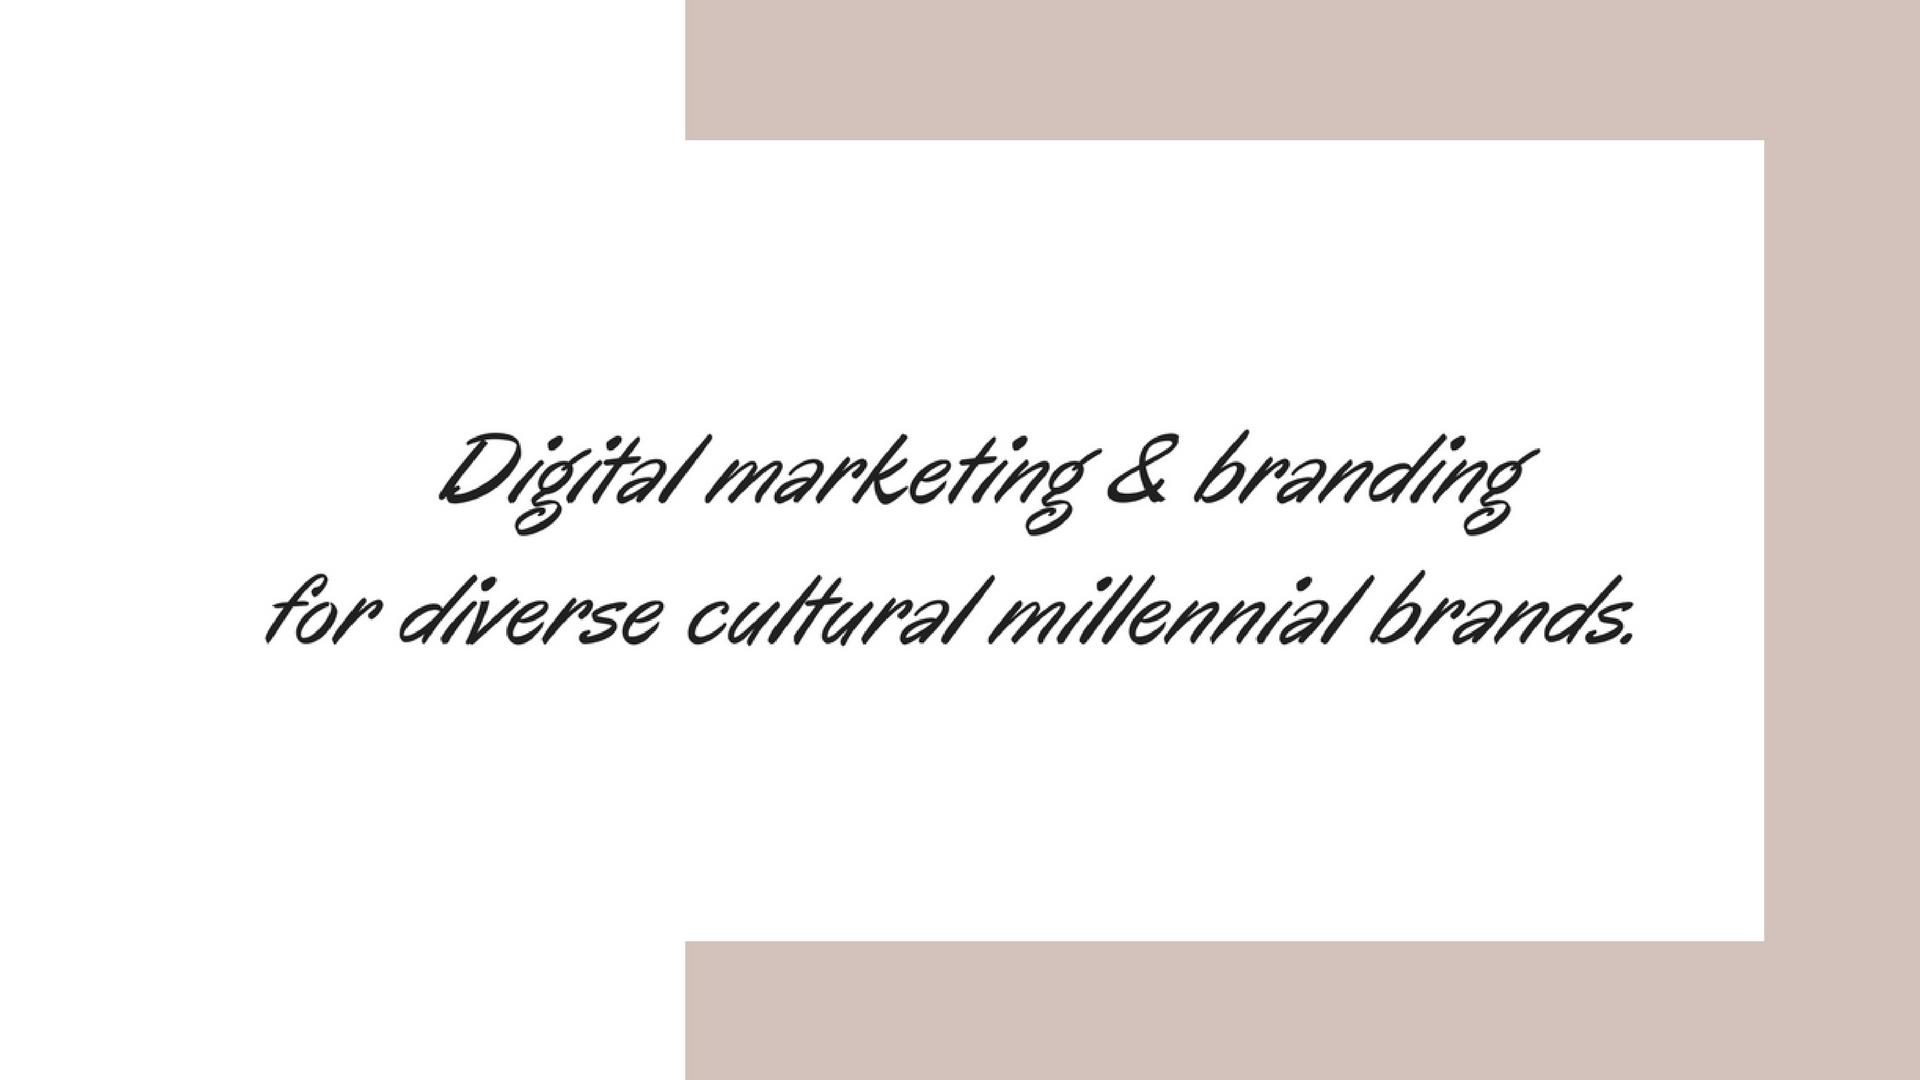 Digital marketing & branding for diverse cultural millennial brands.CONTACT.png